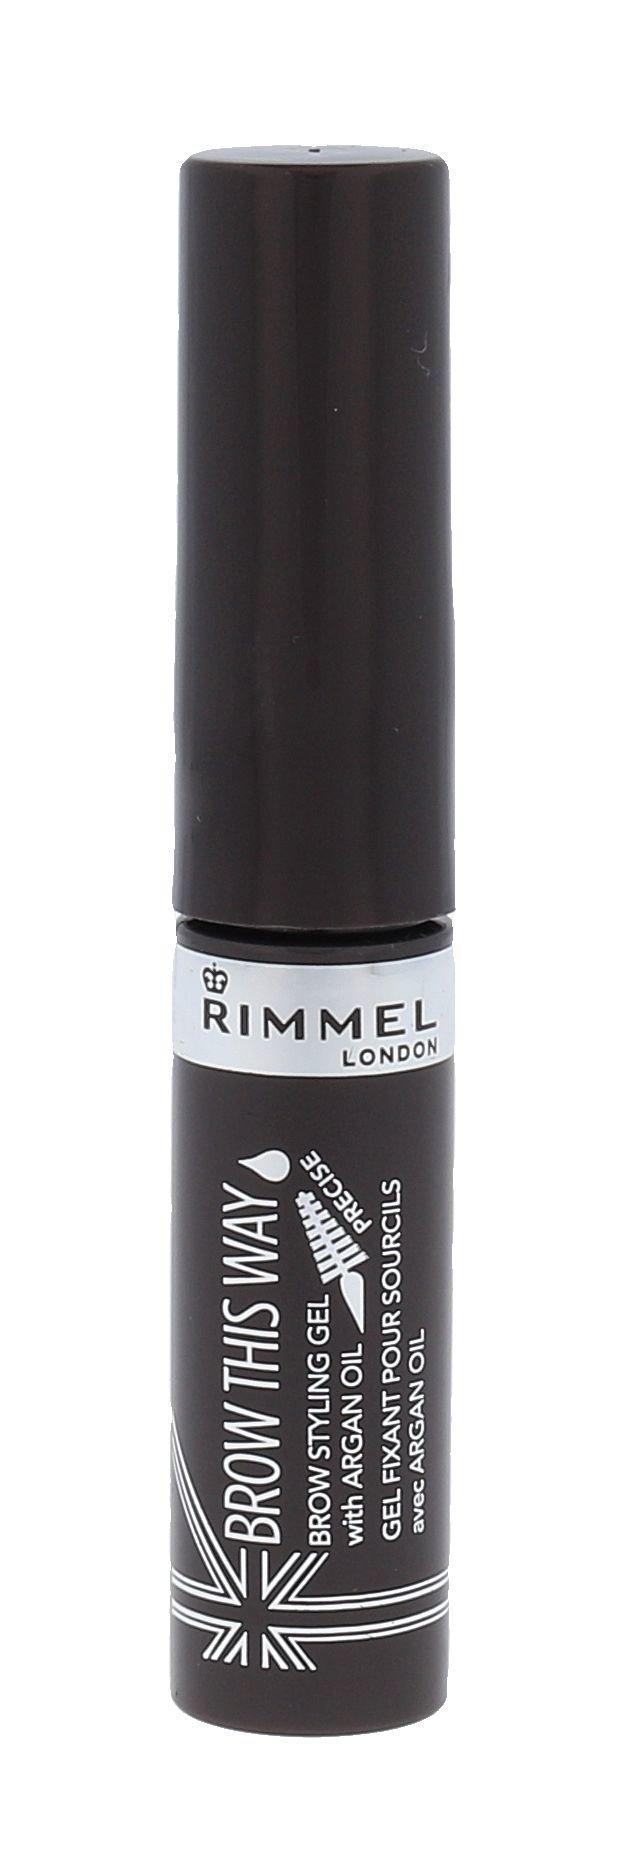 Rimmel London Brow This Way Cosmetic 5ml 003 Dark Brown